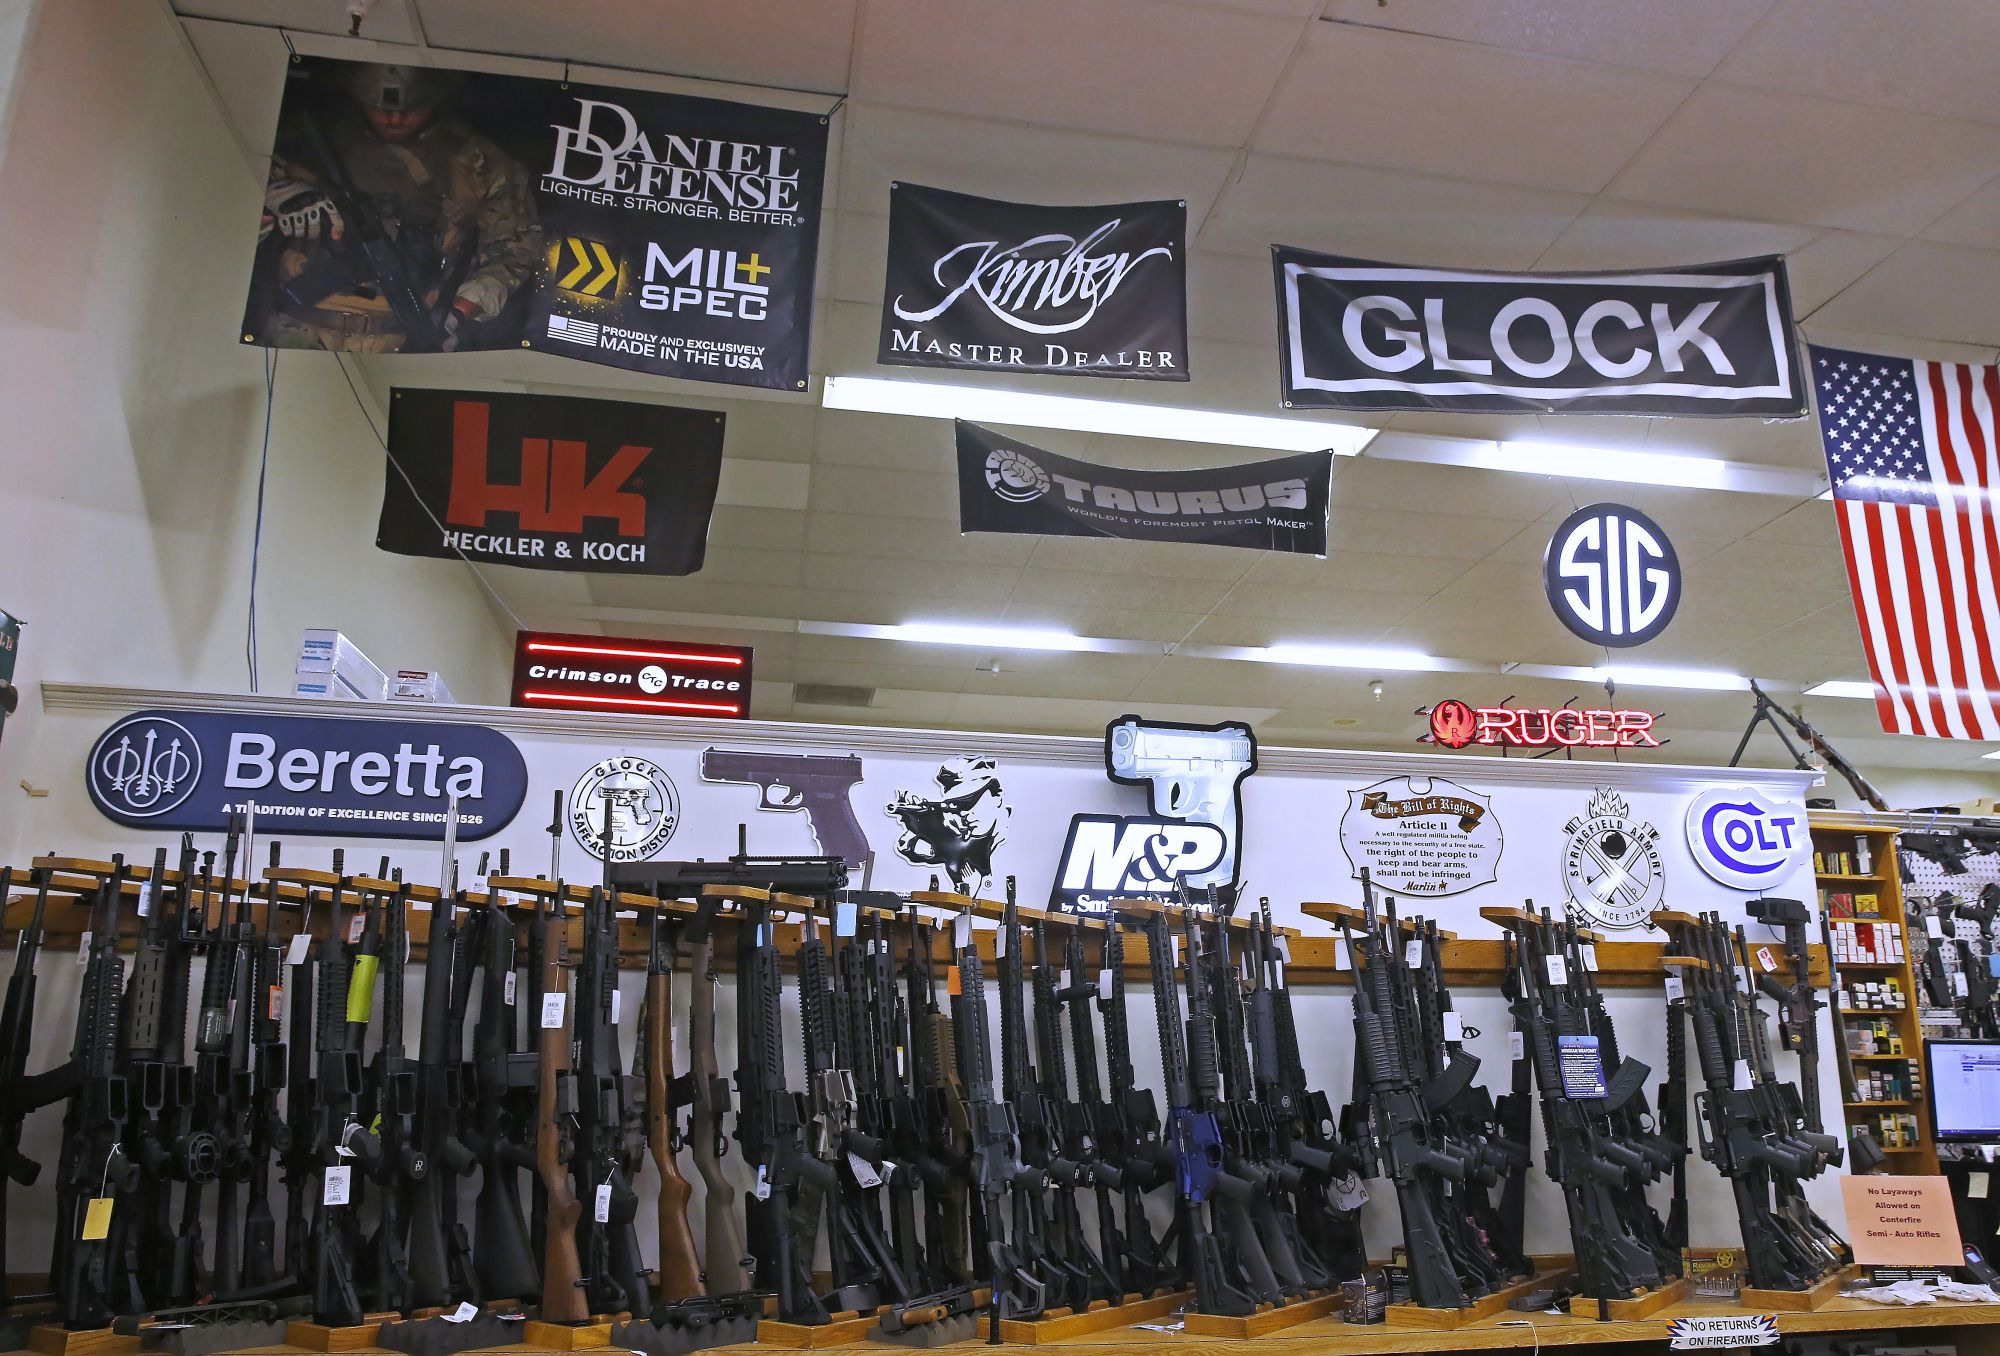 2020 Democrats Warm to Mandatory Buybacks of Assault Weapons